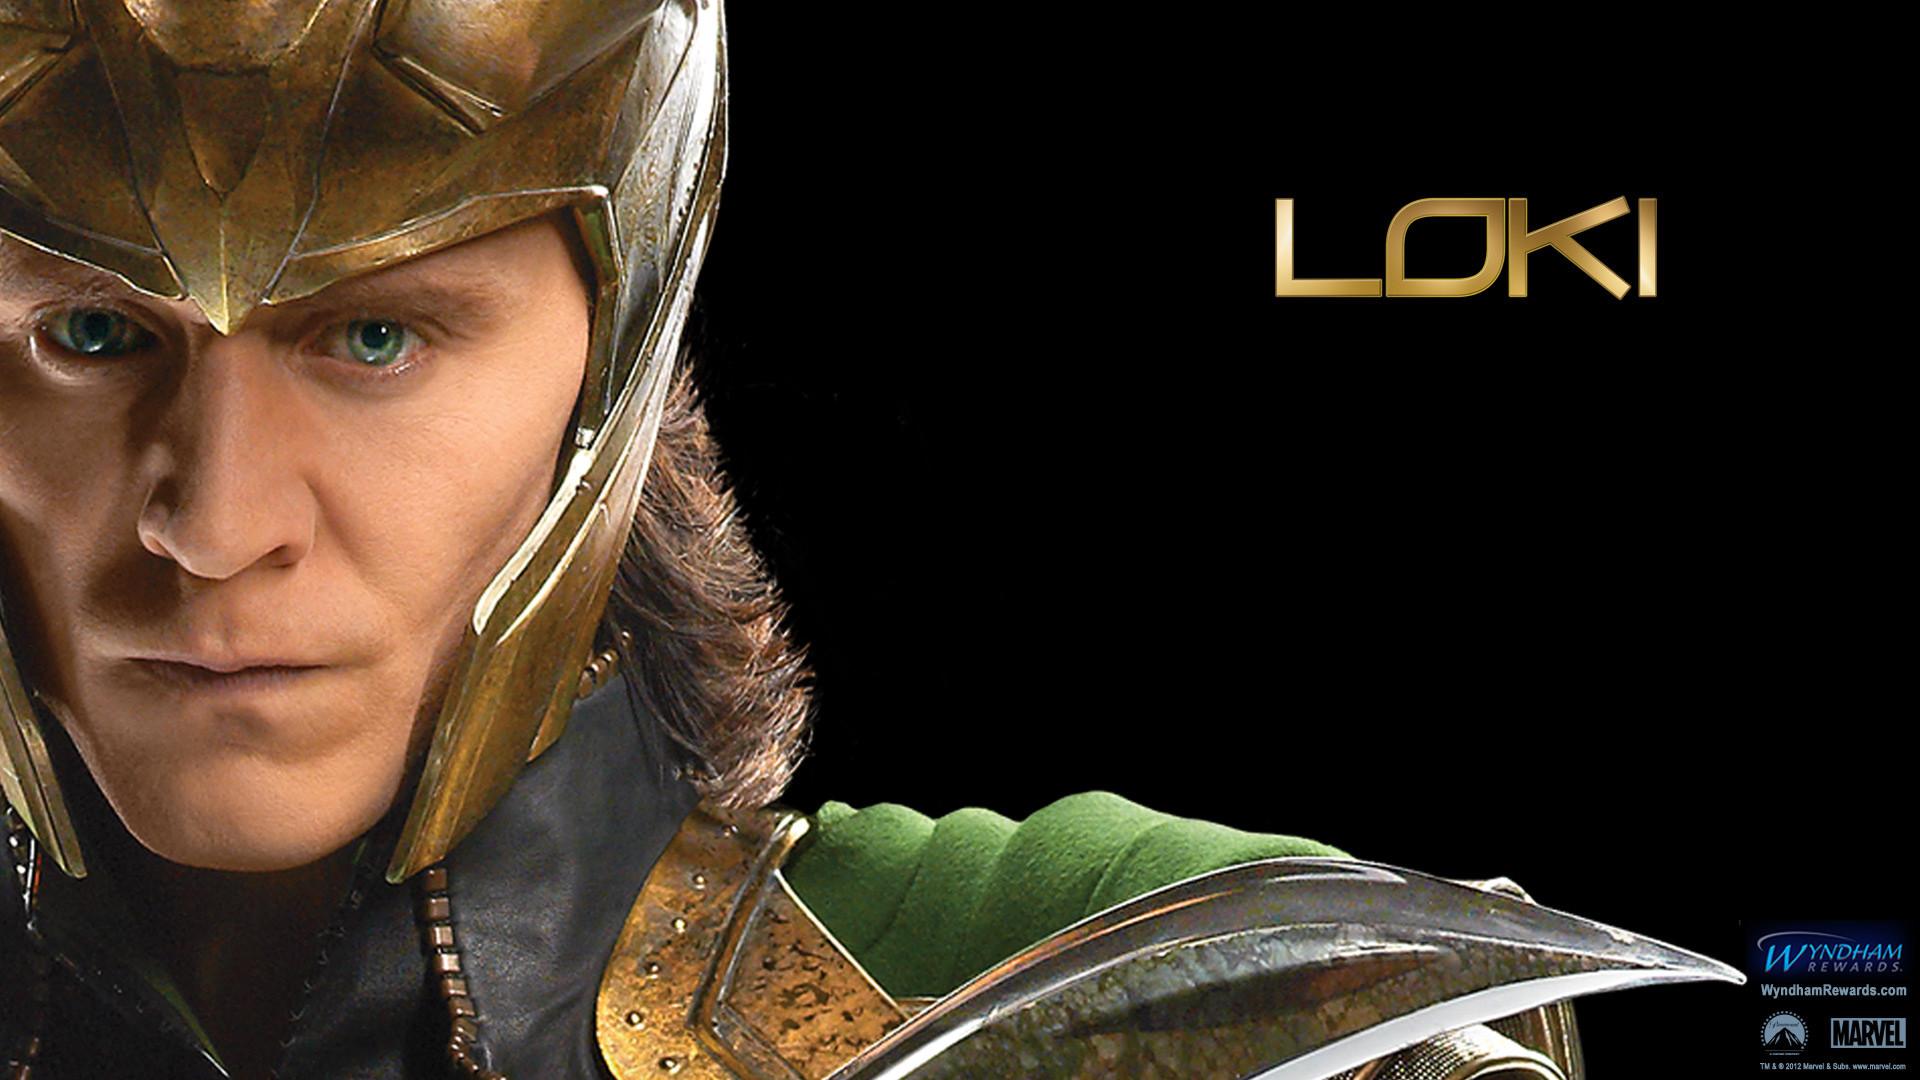 Loki wallpapers | Loki background